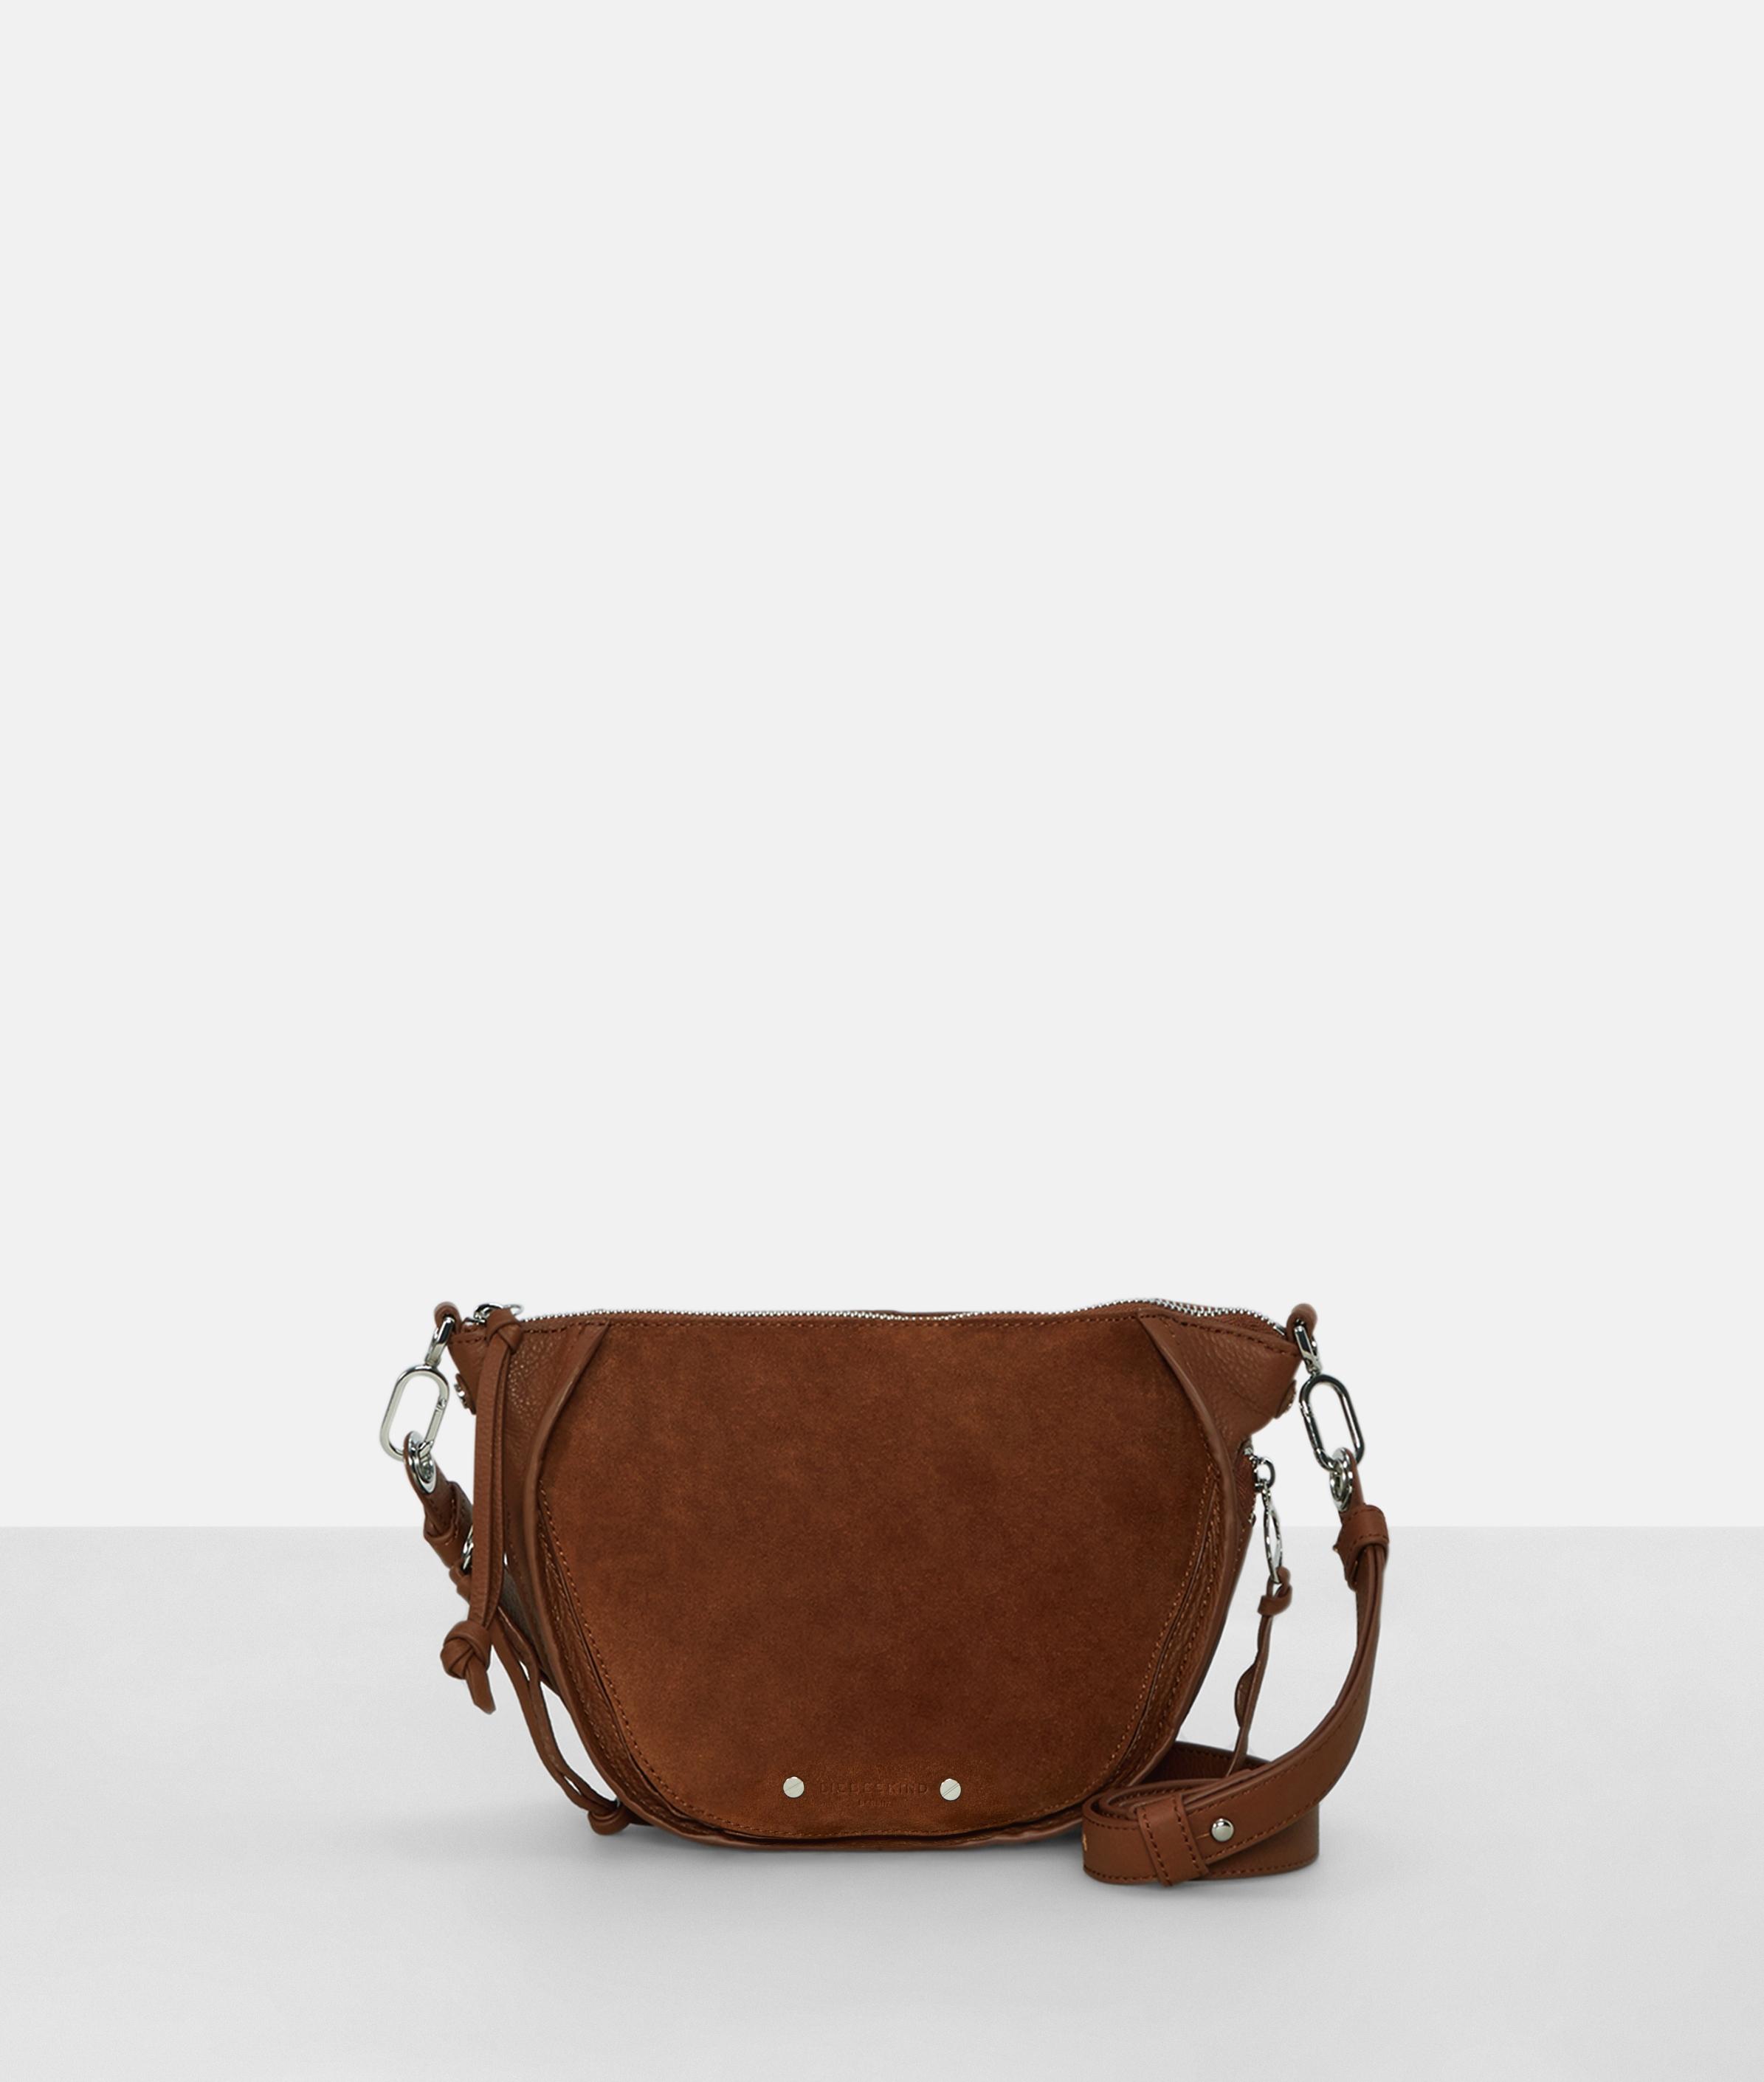 Berlin Tasche Saddy Suede Crossbody Bag XS, Braun